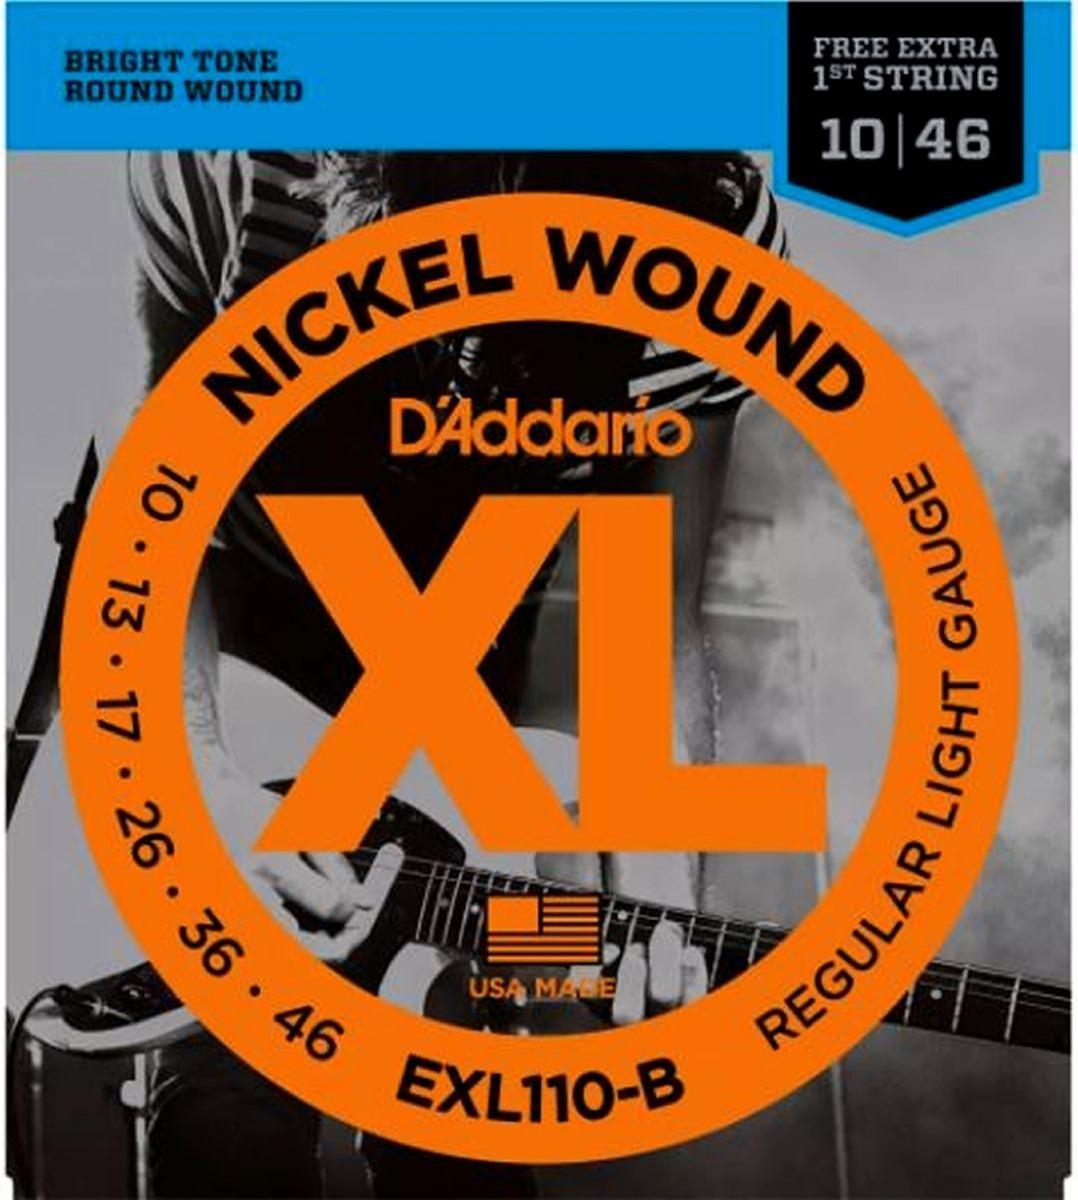 Encordoamento D'ADDARIO EXL110-B 0.010-0.046 Para Guitarra